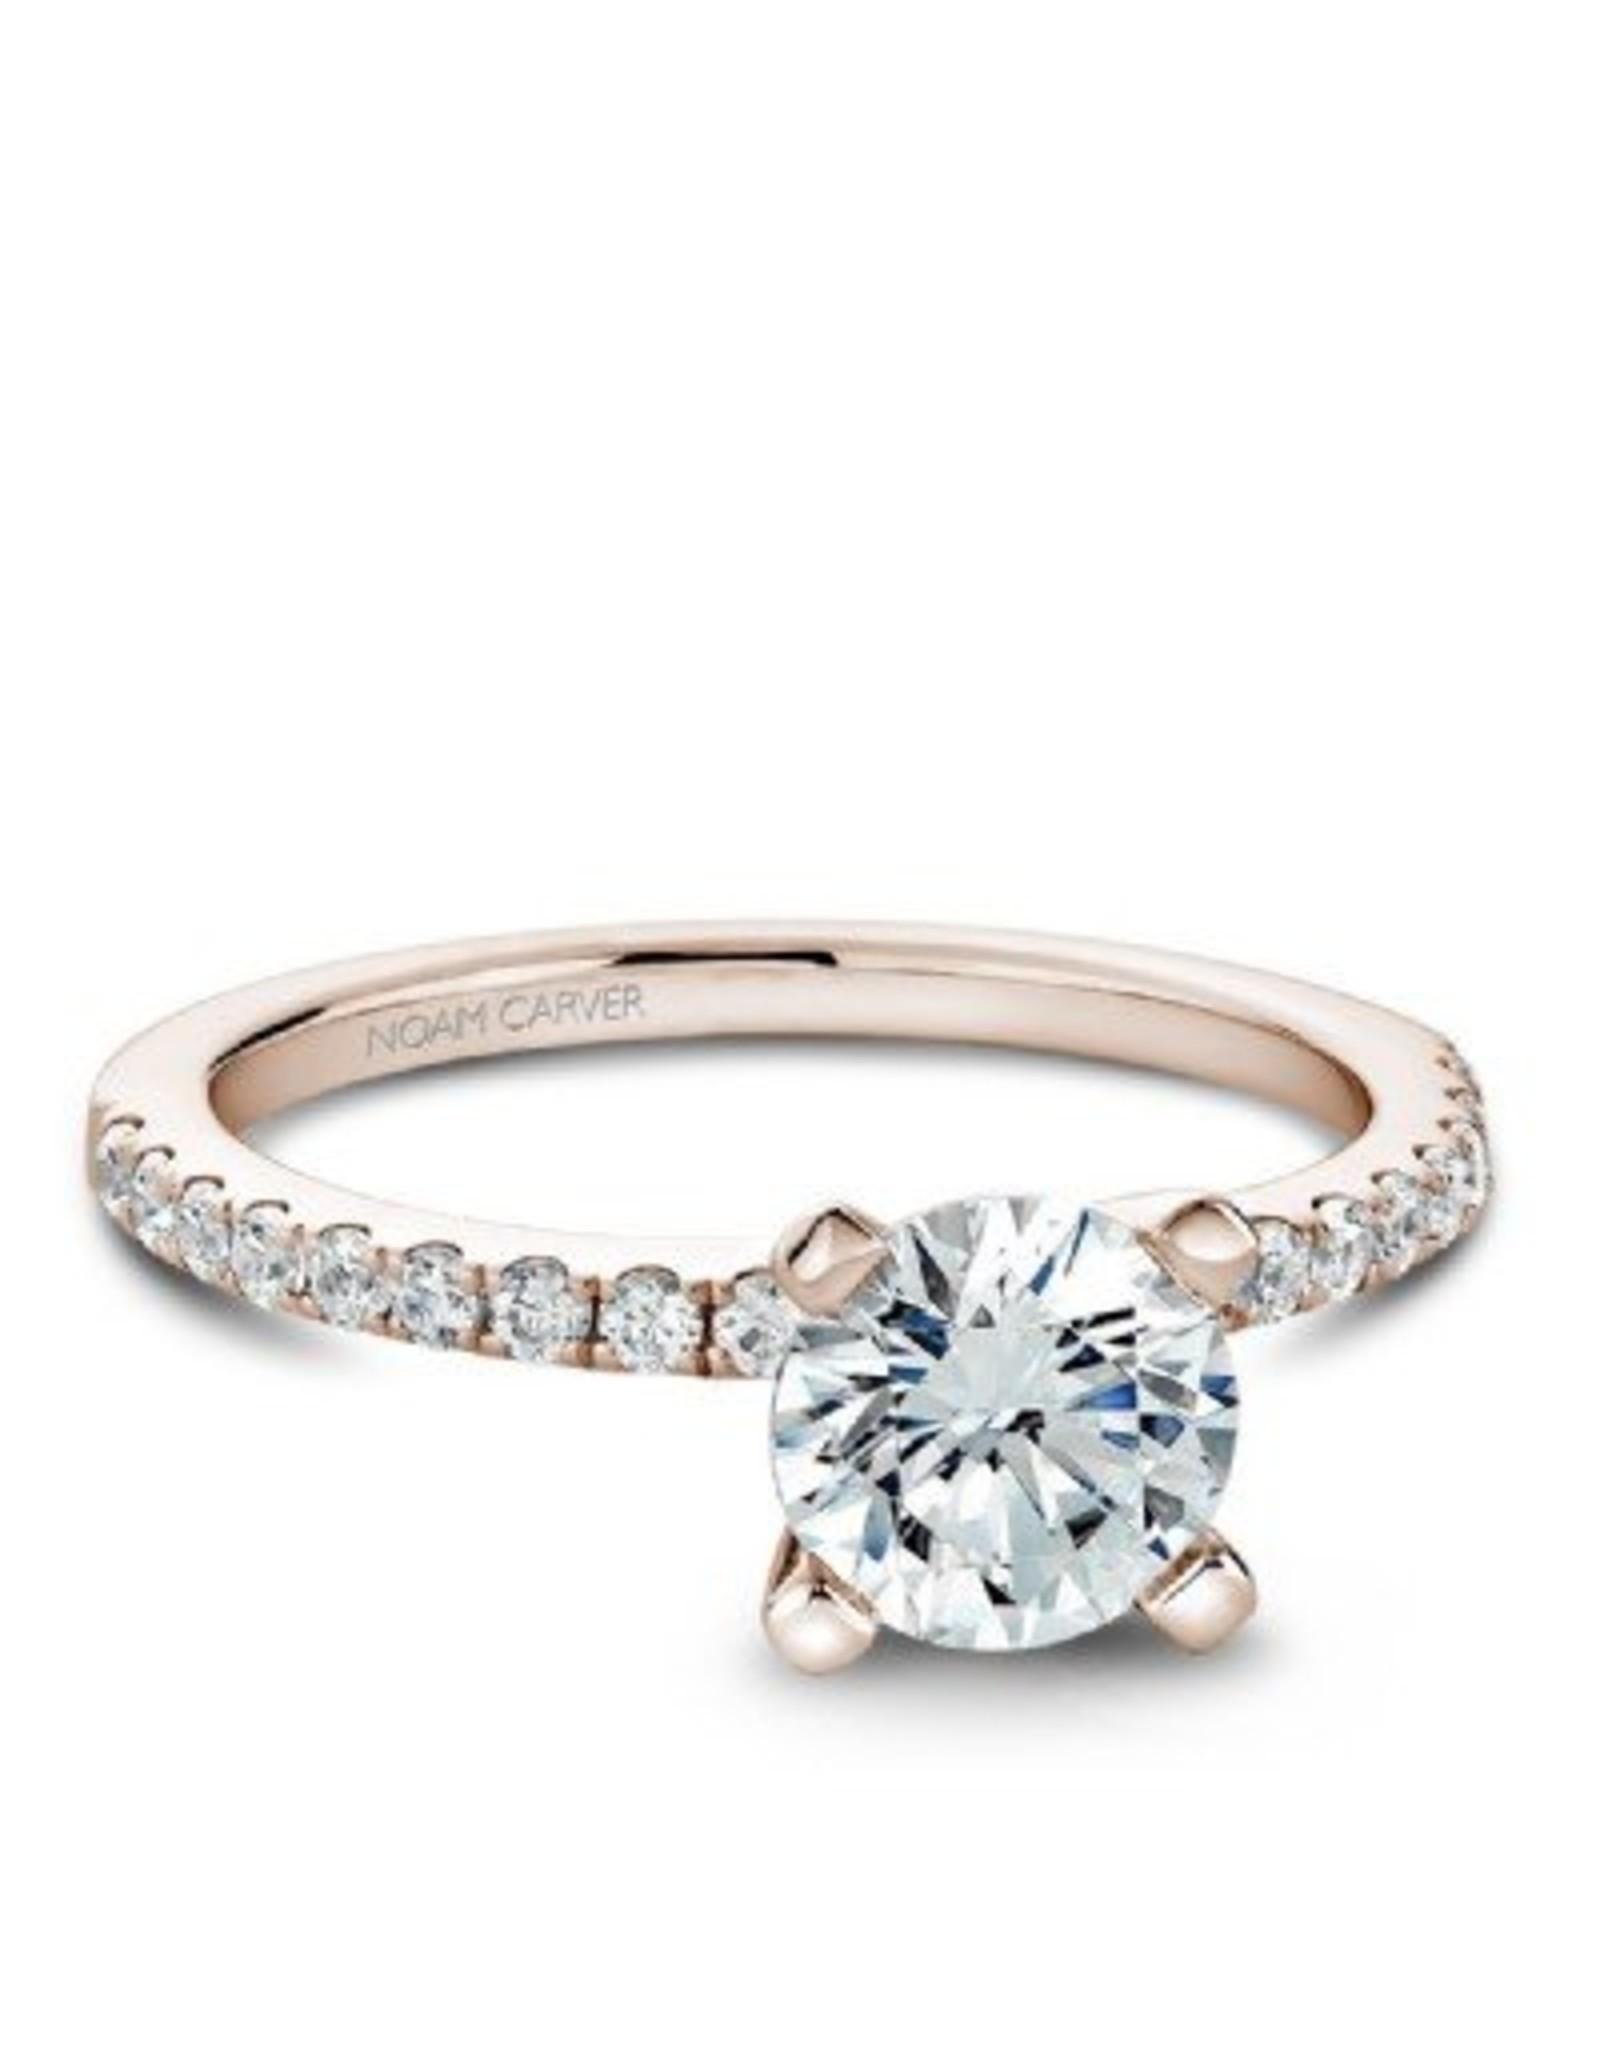 Noam Carver Diamond Semi-Mount by Noam Carver 14KR